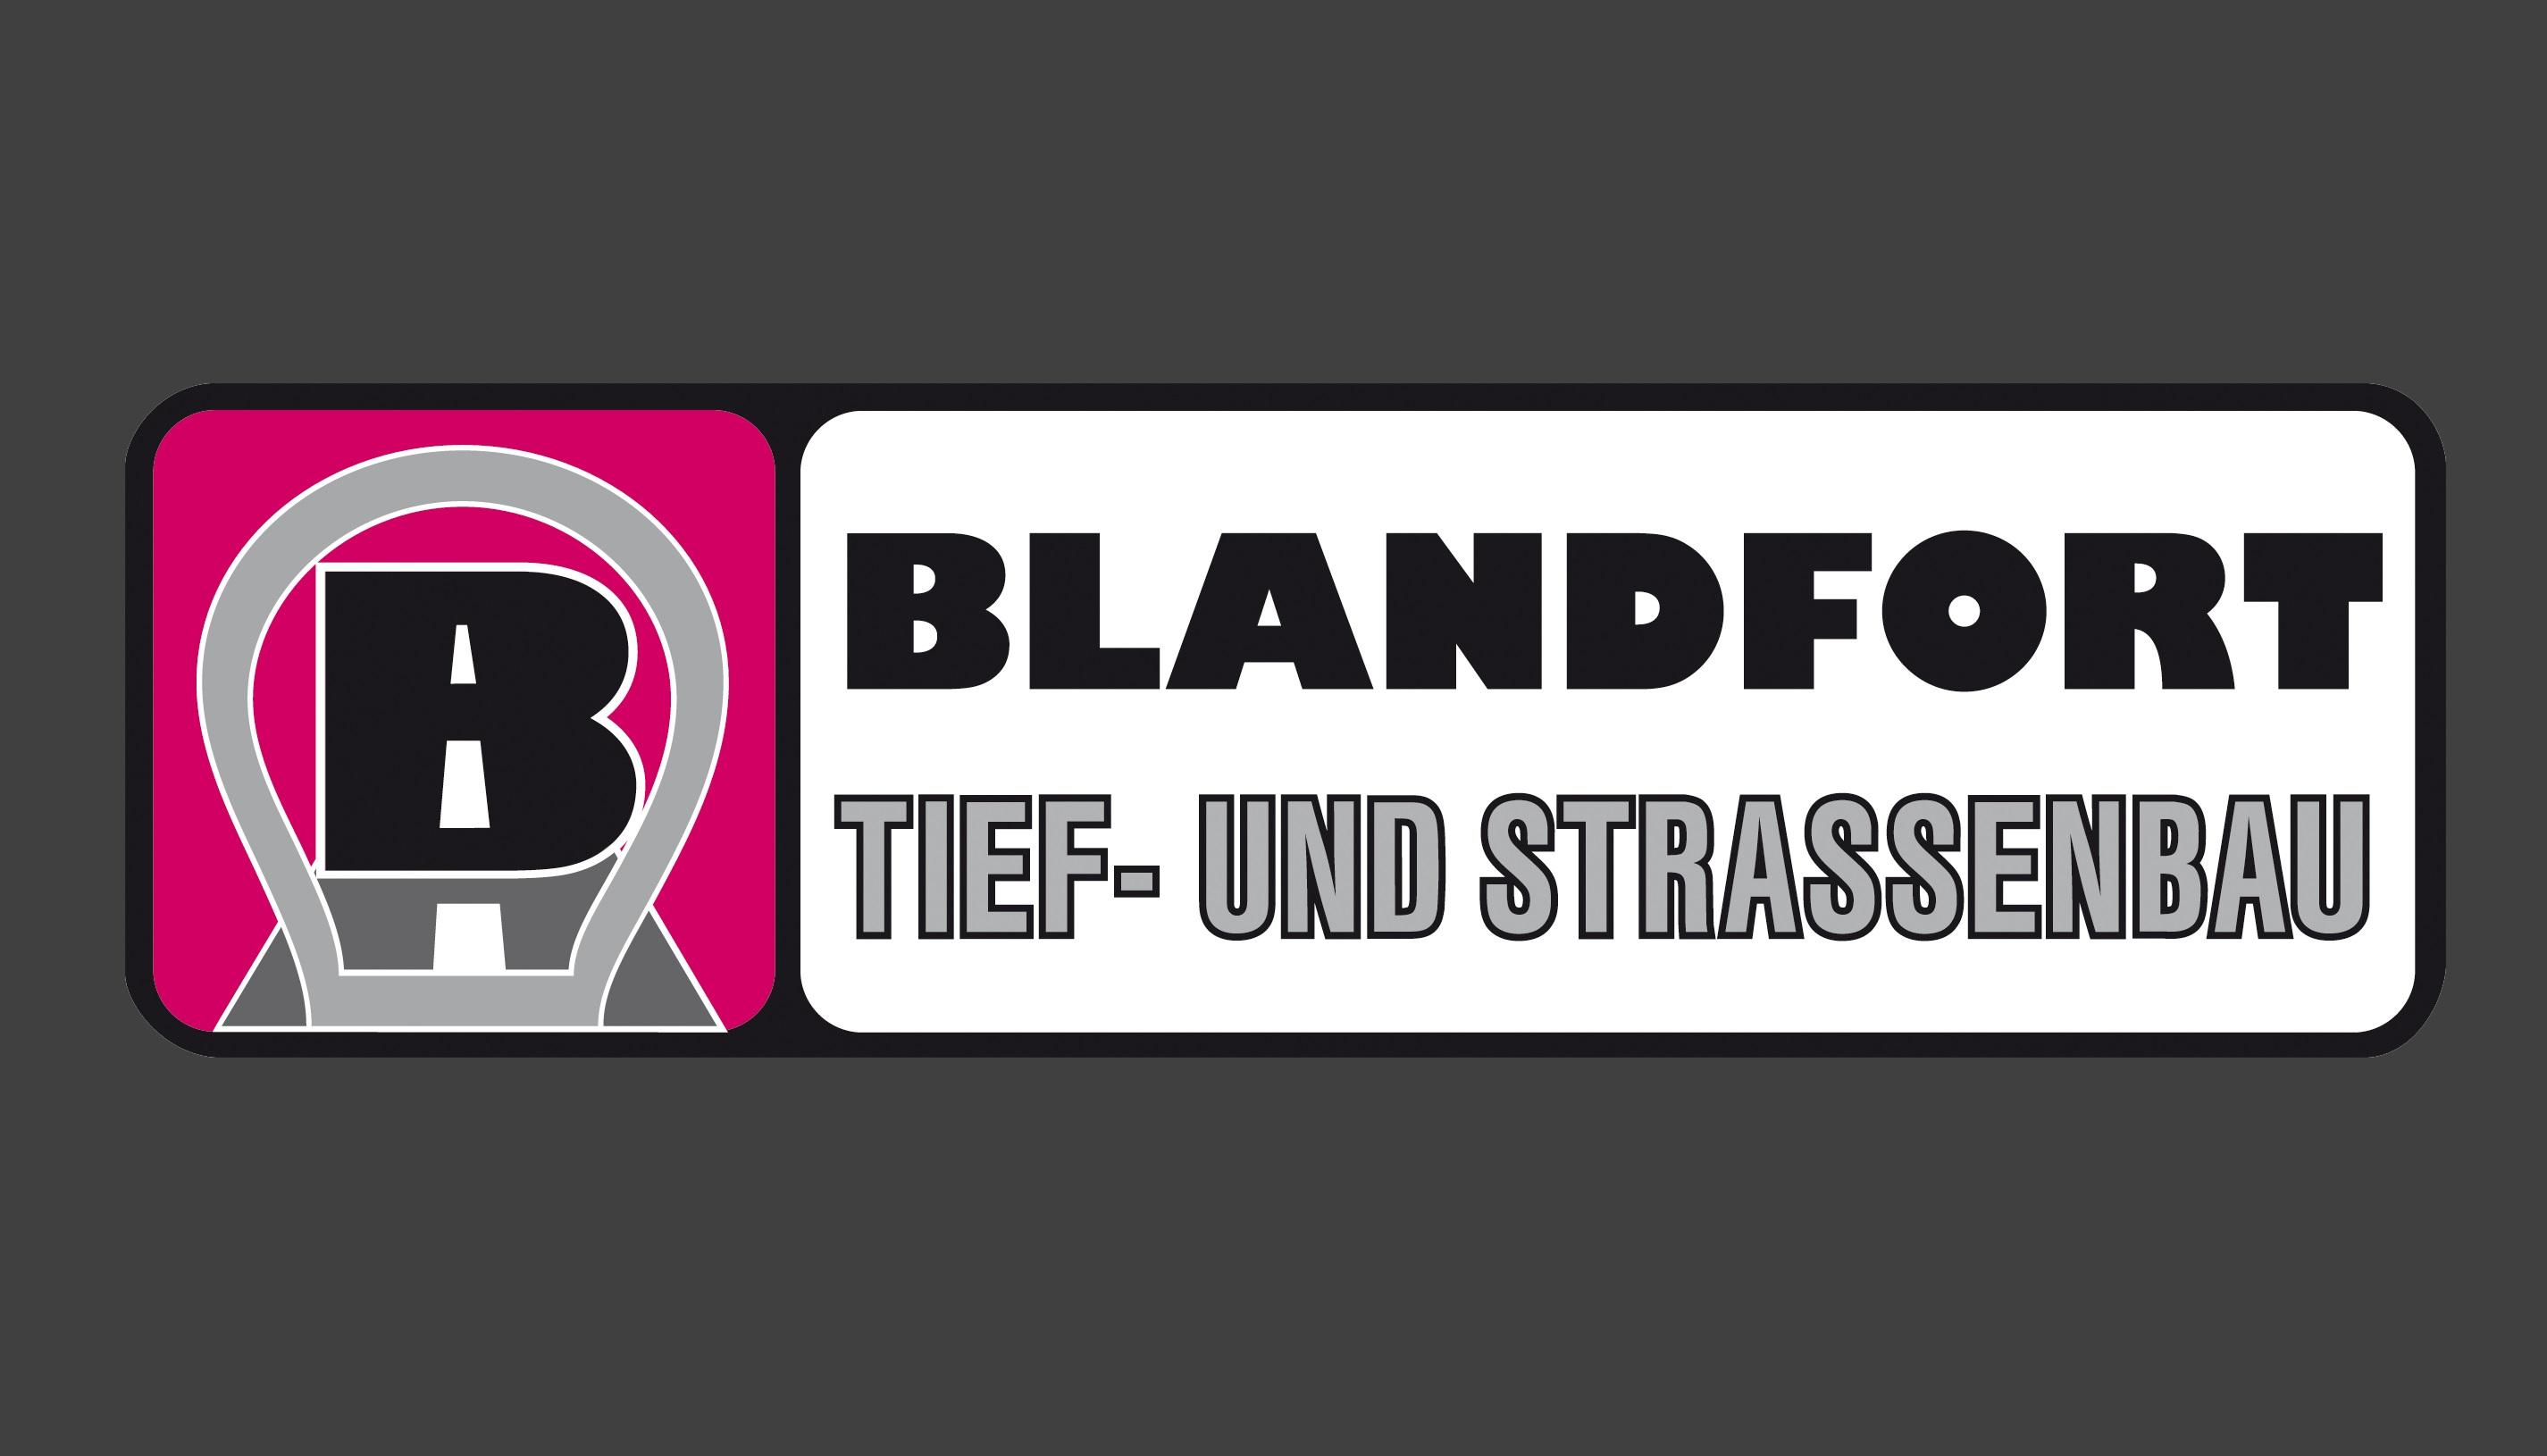 Blandfort